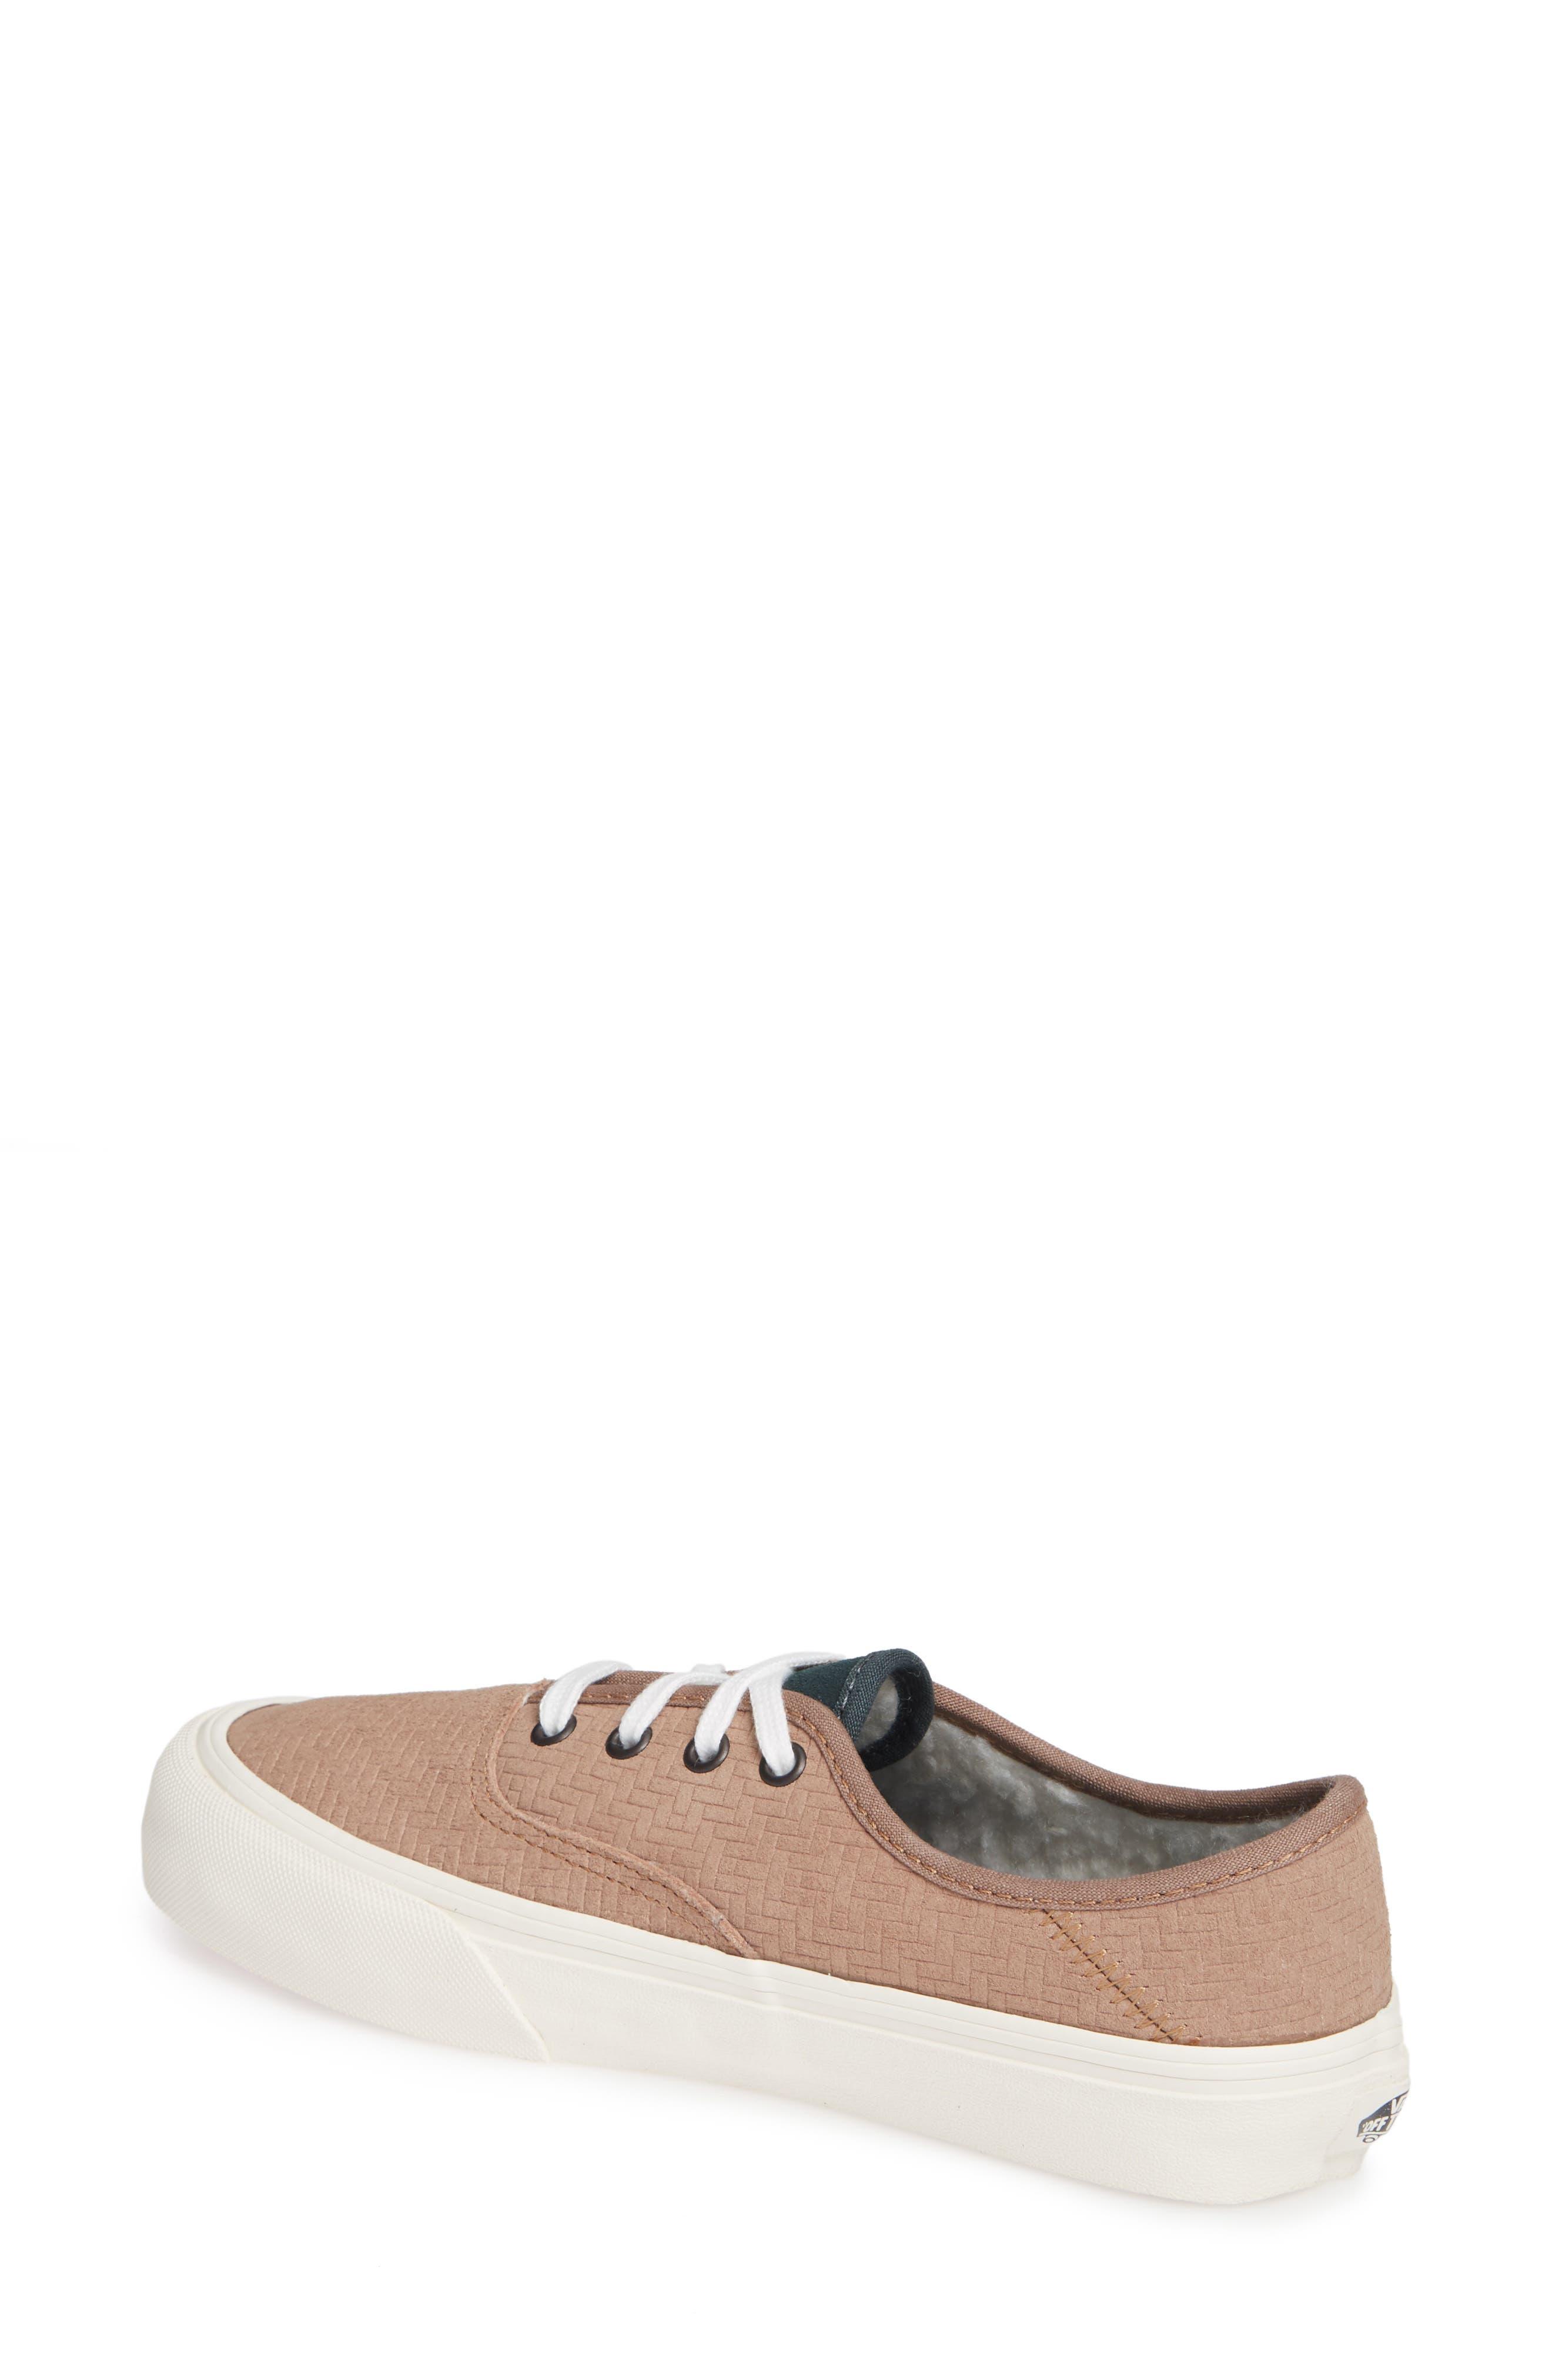 UA Authentic SF Collapsible Heel Sneaker,                             Alternate thumbnail 2, color,                             WOODSMOKE/ DARKEST SPRUCE